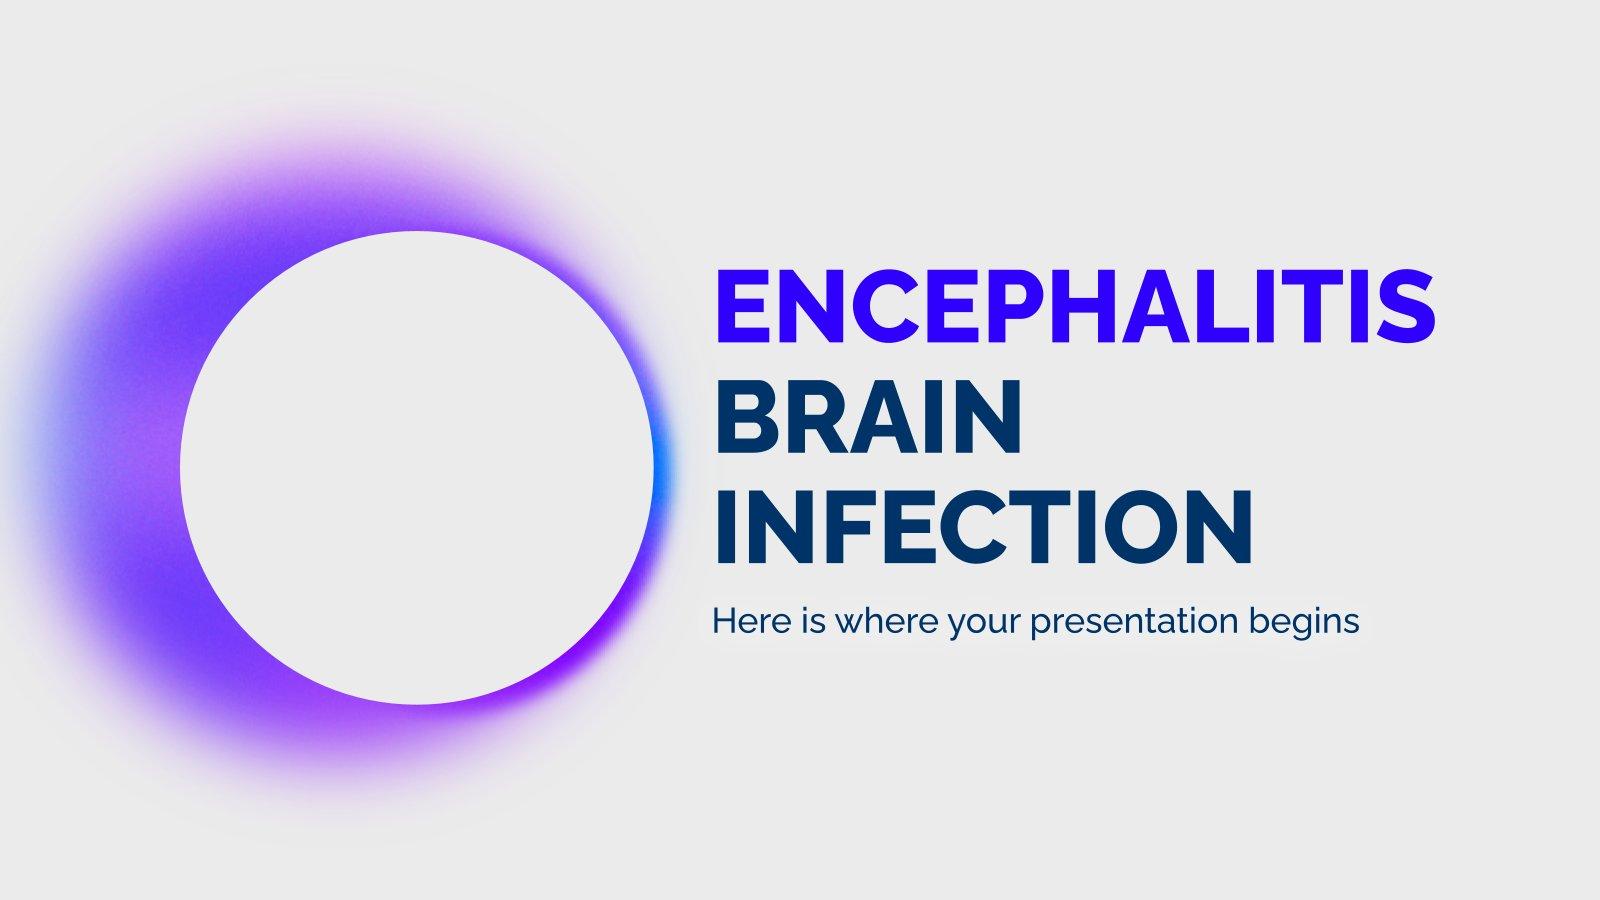 Encephalitis Brain Infection presentation template